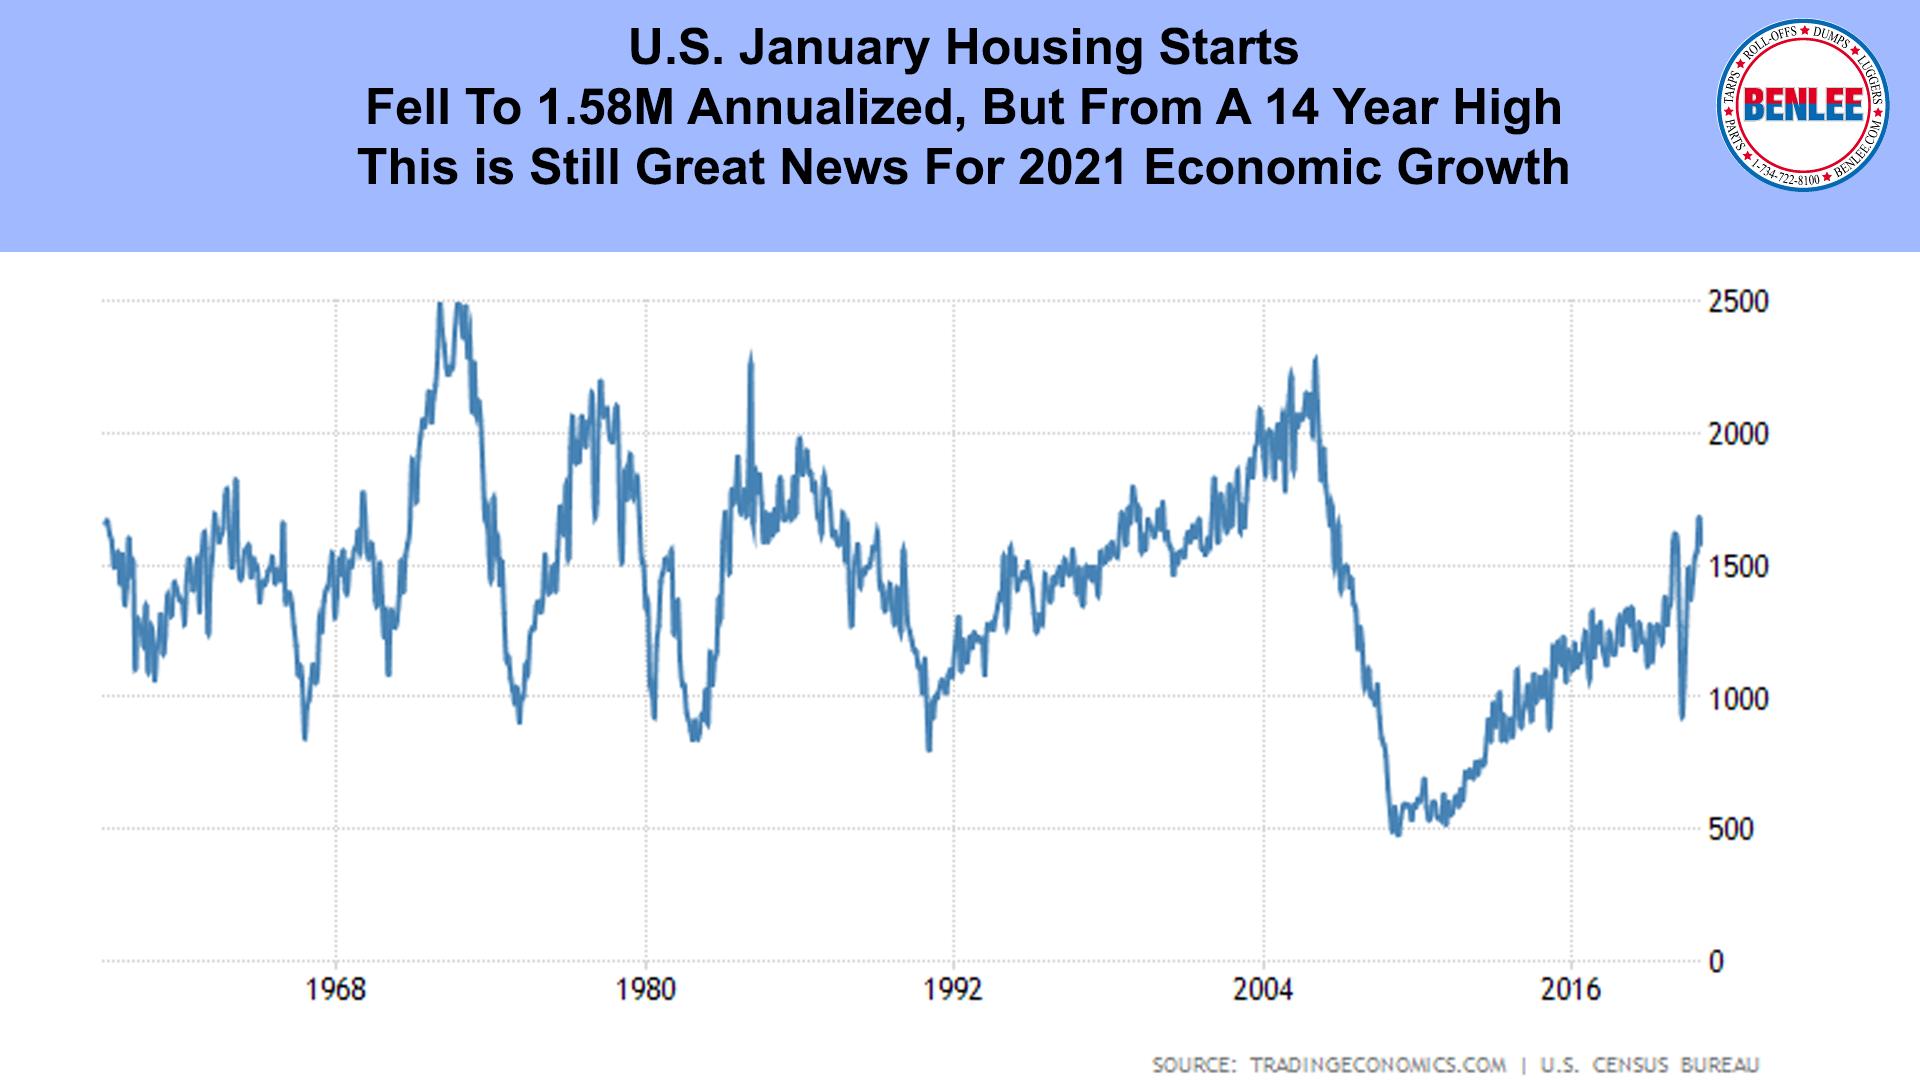 U.S. January Housing Starts